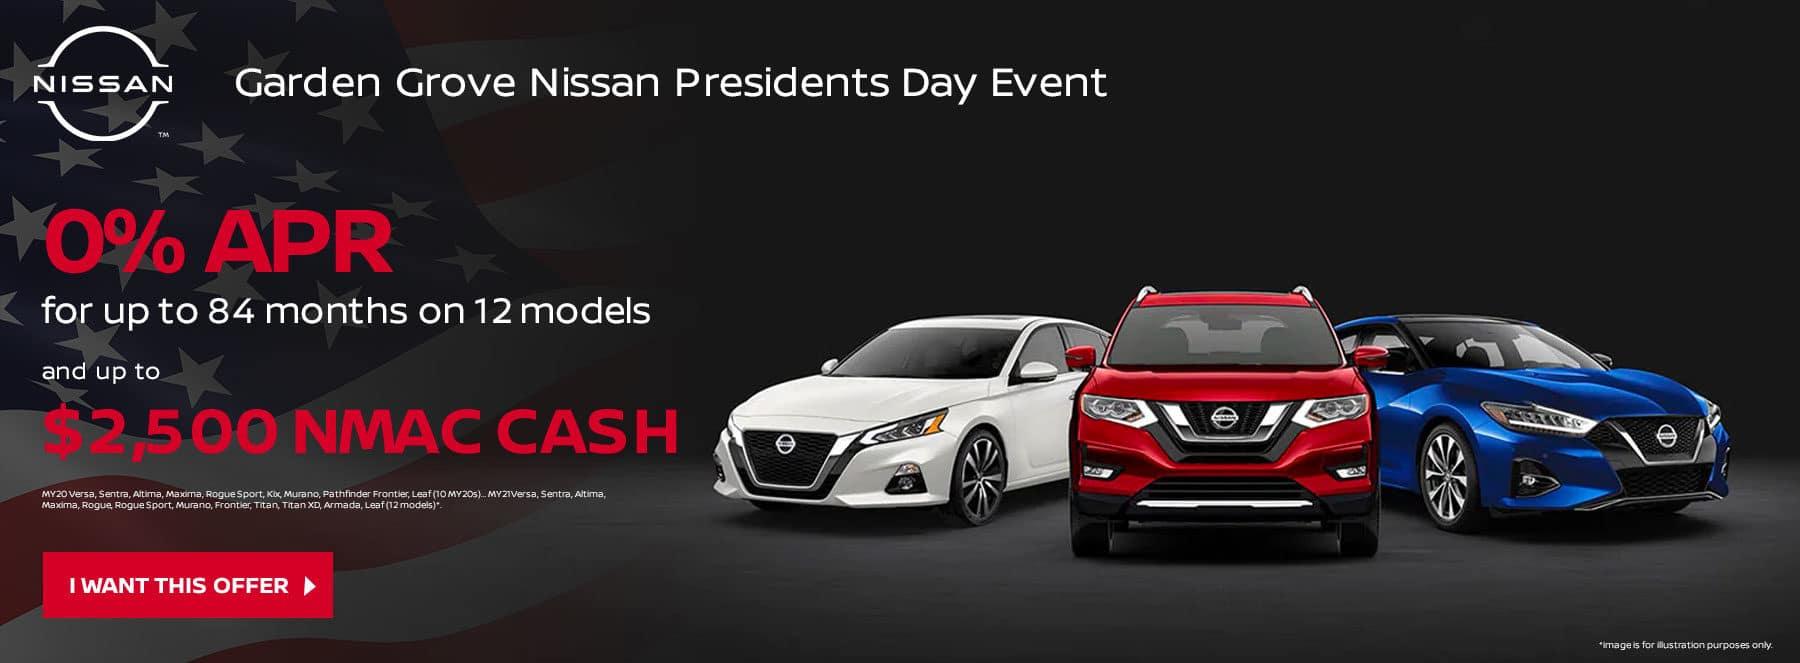 Garden Grove Nissan Presidents Day Event